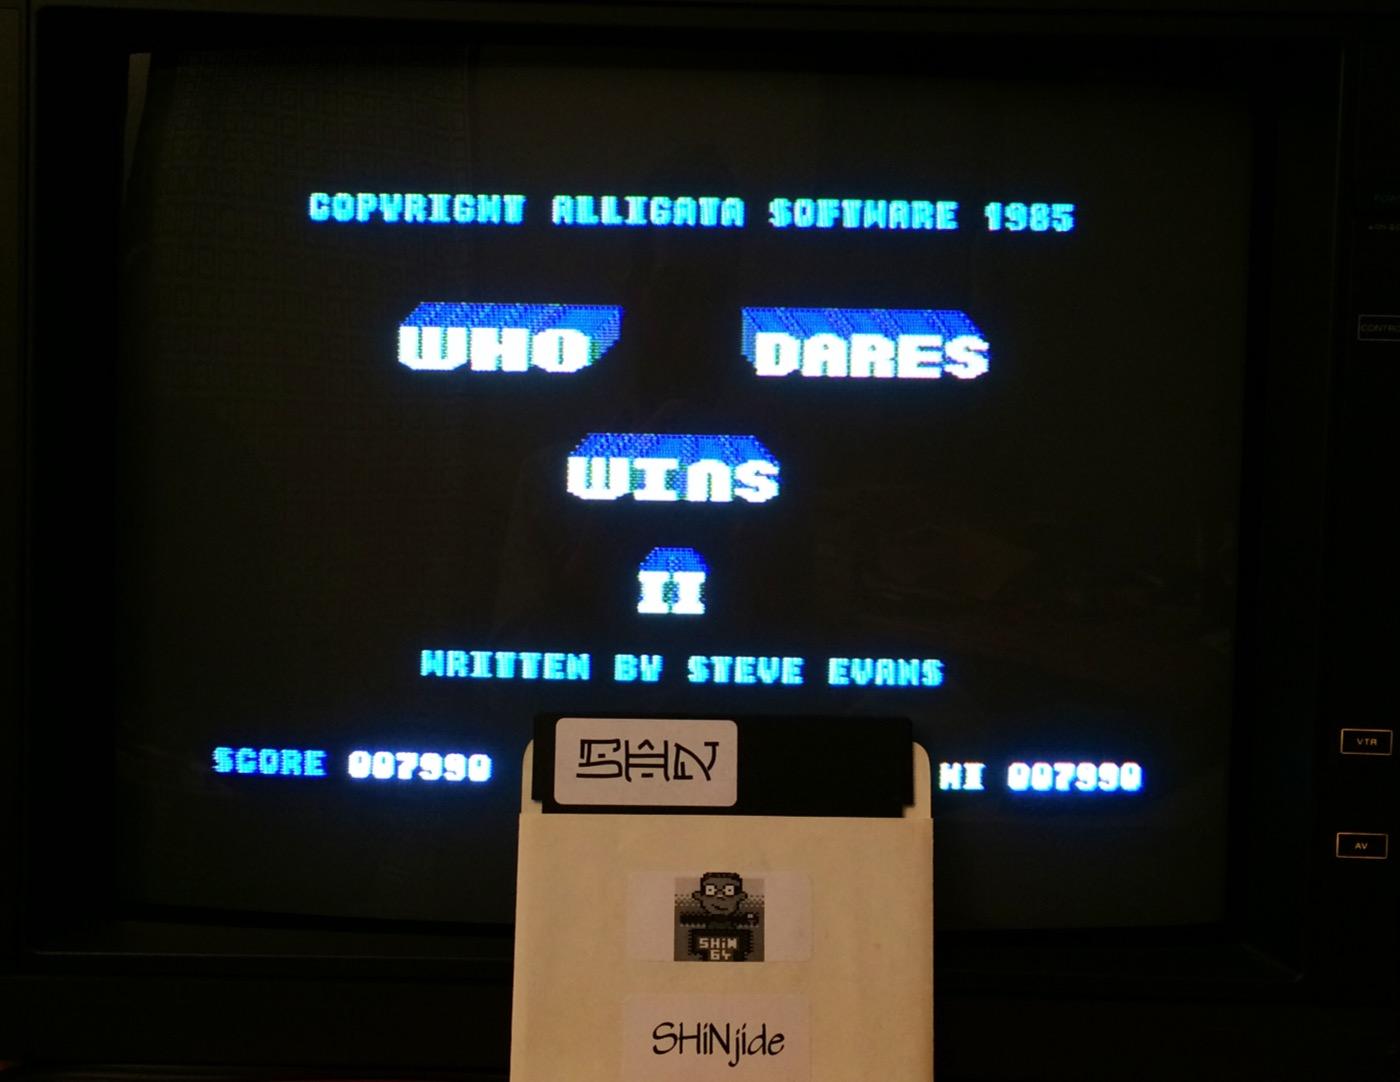 SHiNjide: Who Dares Wins II [Alligata] (Commodore 64) 7,990 points on 2014-09-25 16:05:33